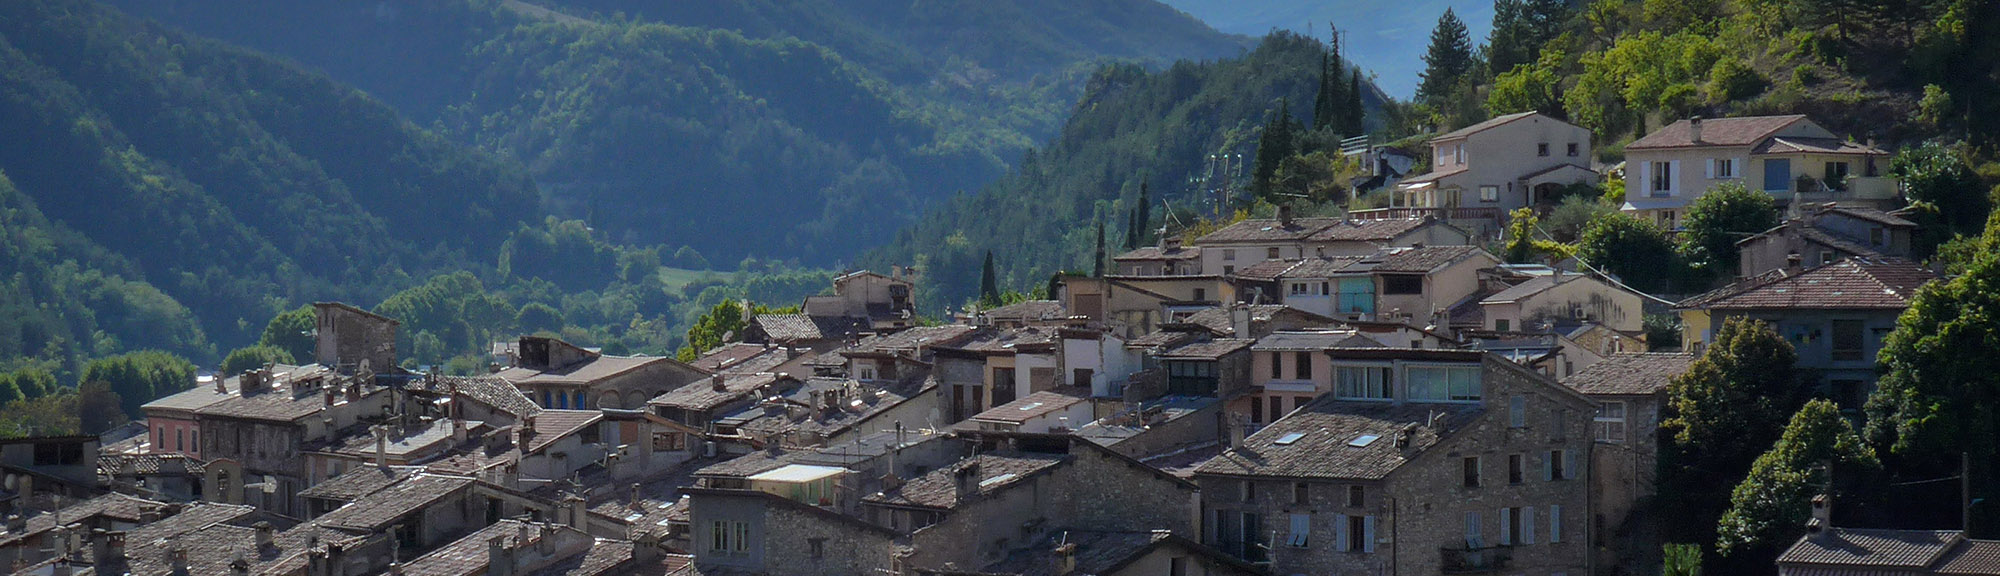 Puget Théniers, Alpes-Maritime